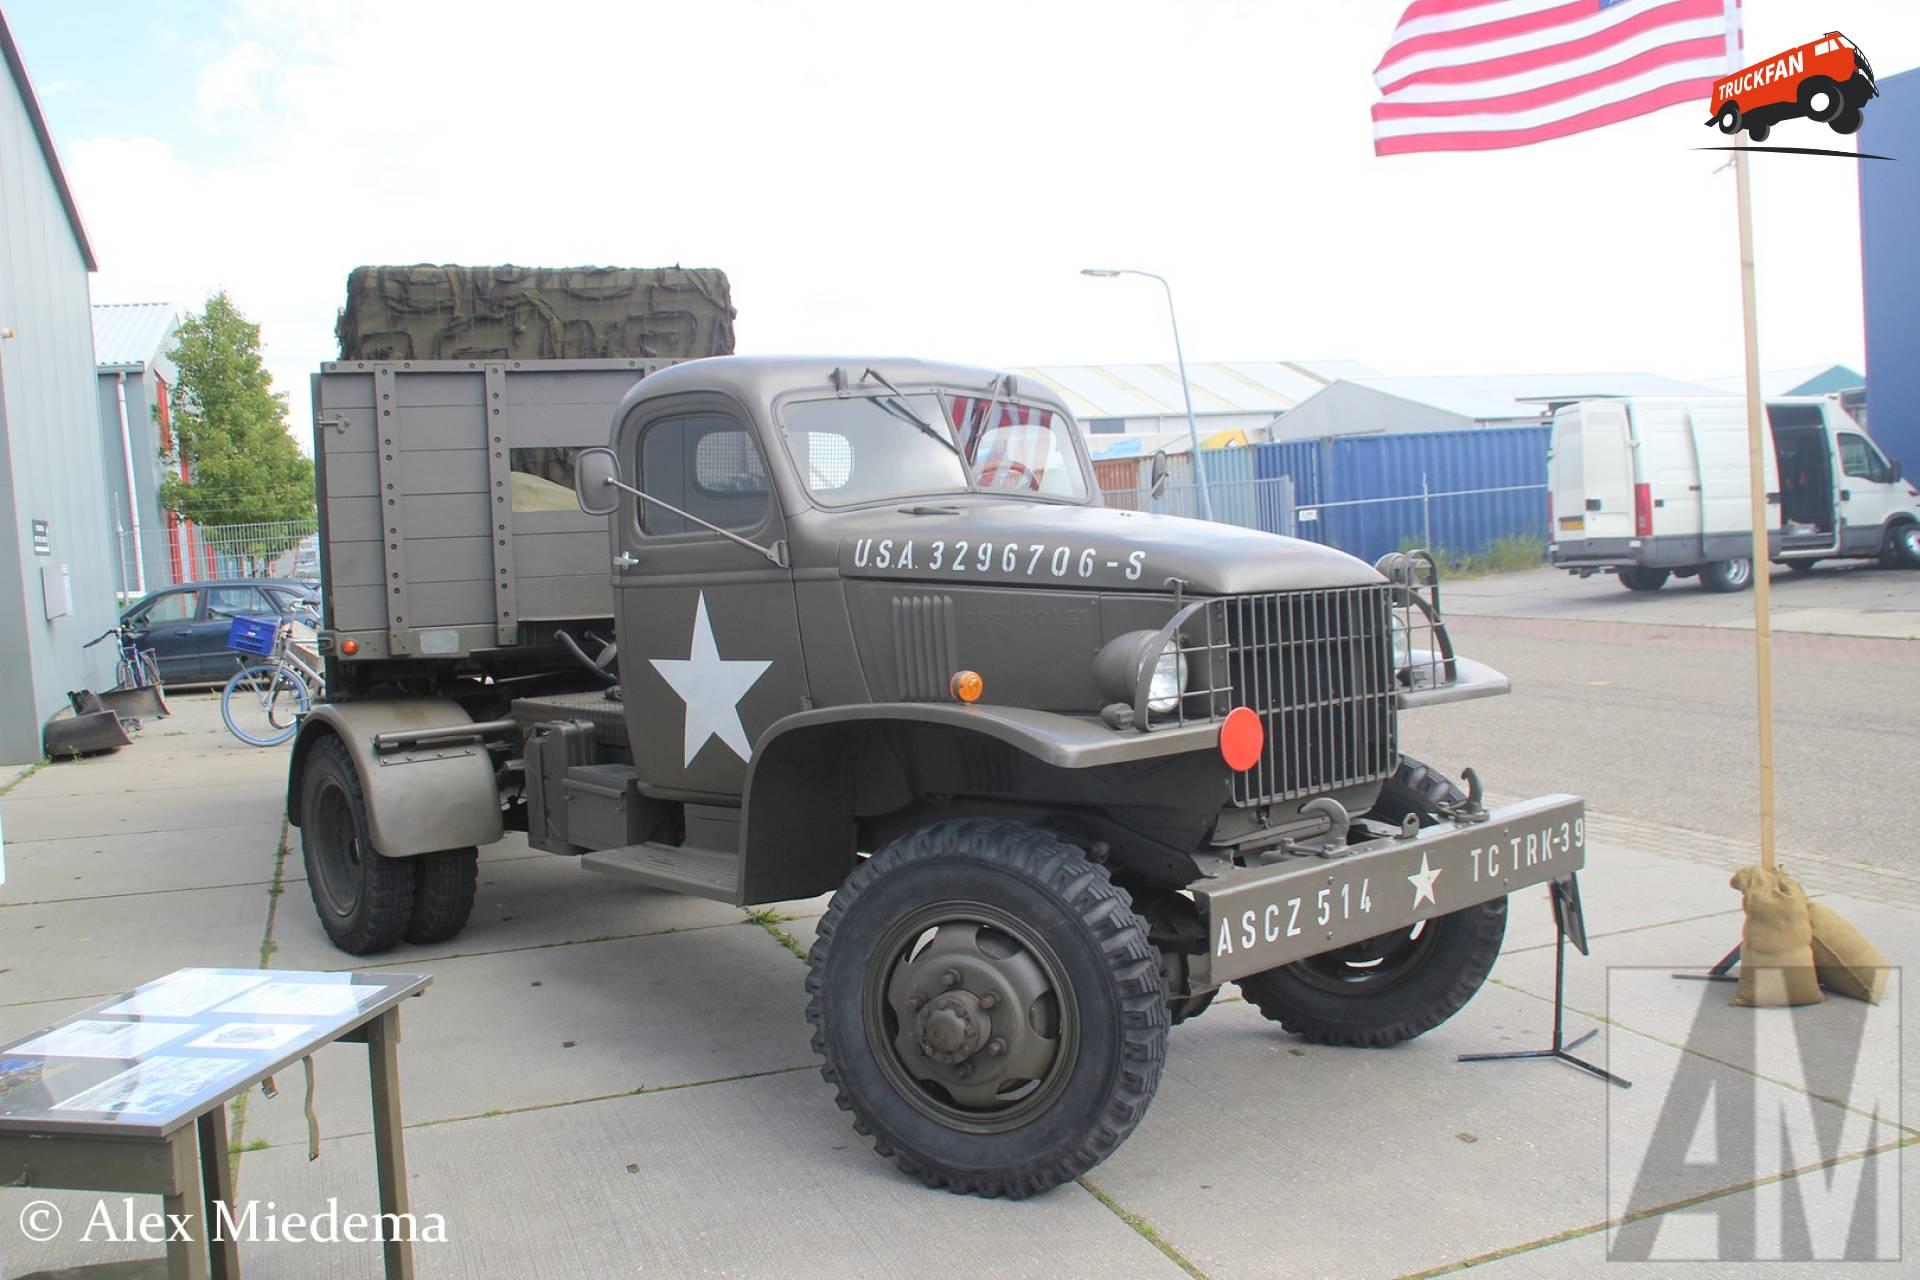 Chevrolet G-7113